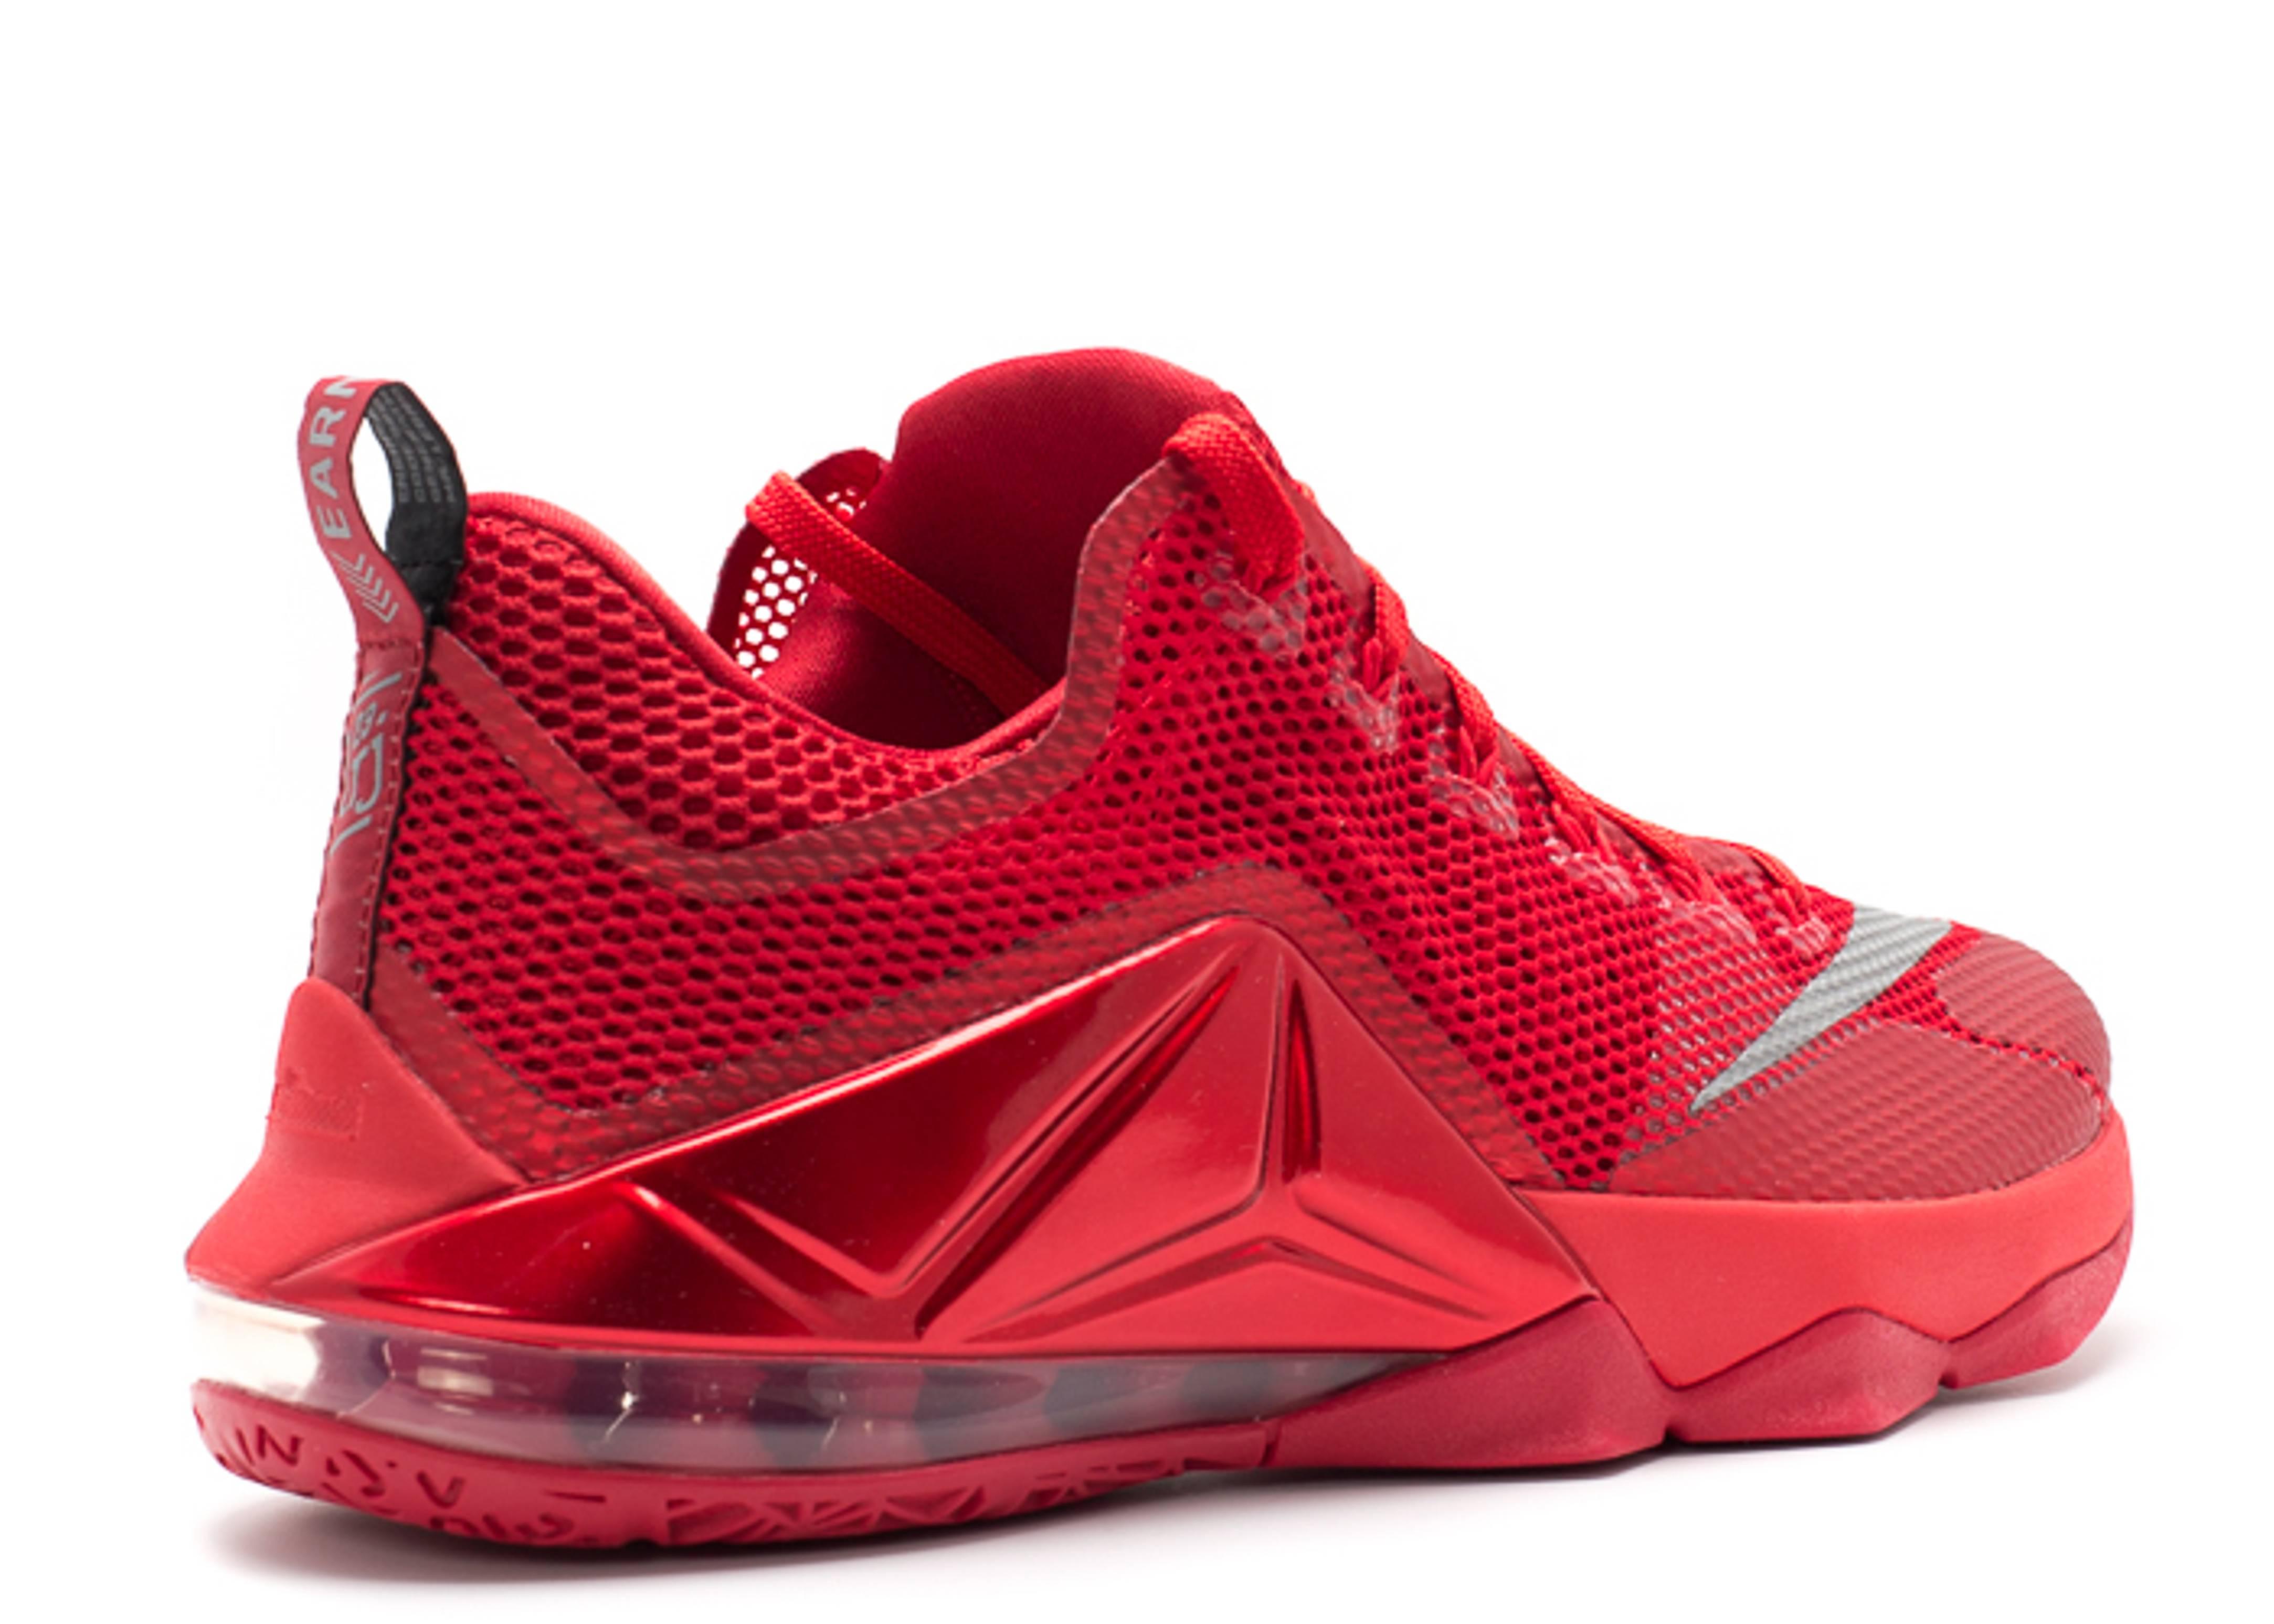 a7ec7926c0e lebron 12 low - unvrsty rd rflct slvr-gym rd-b - Nike